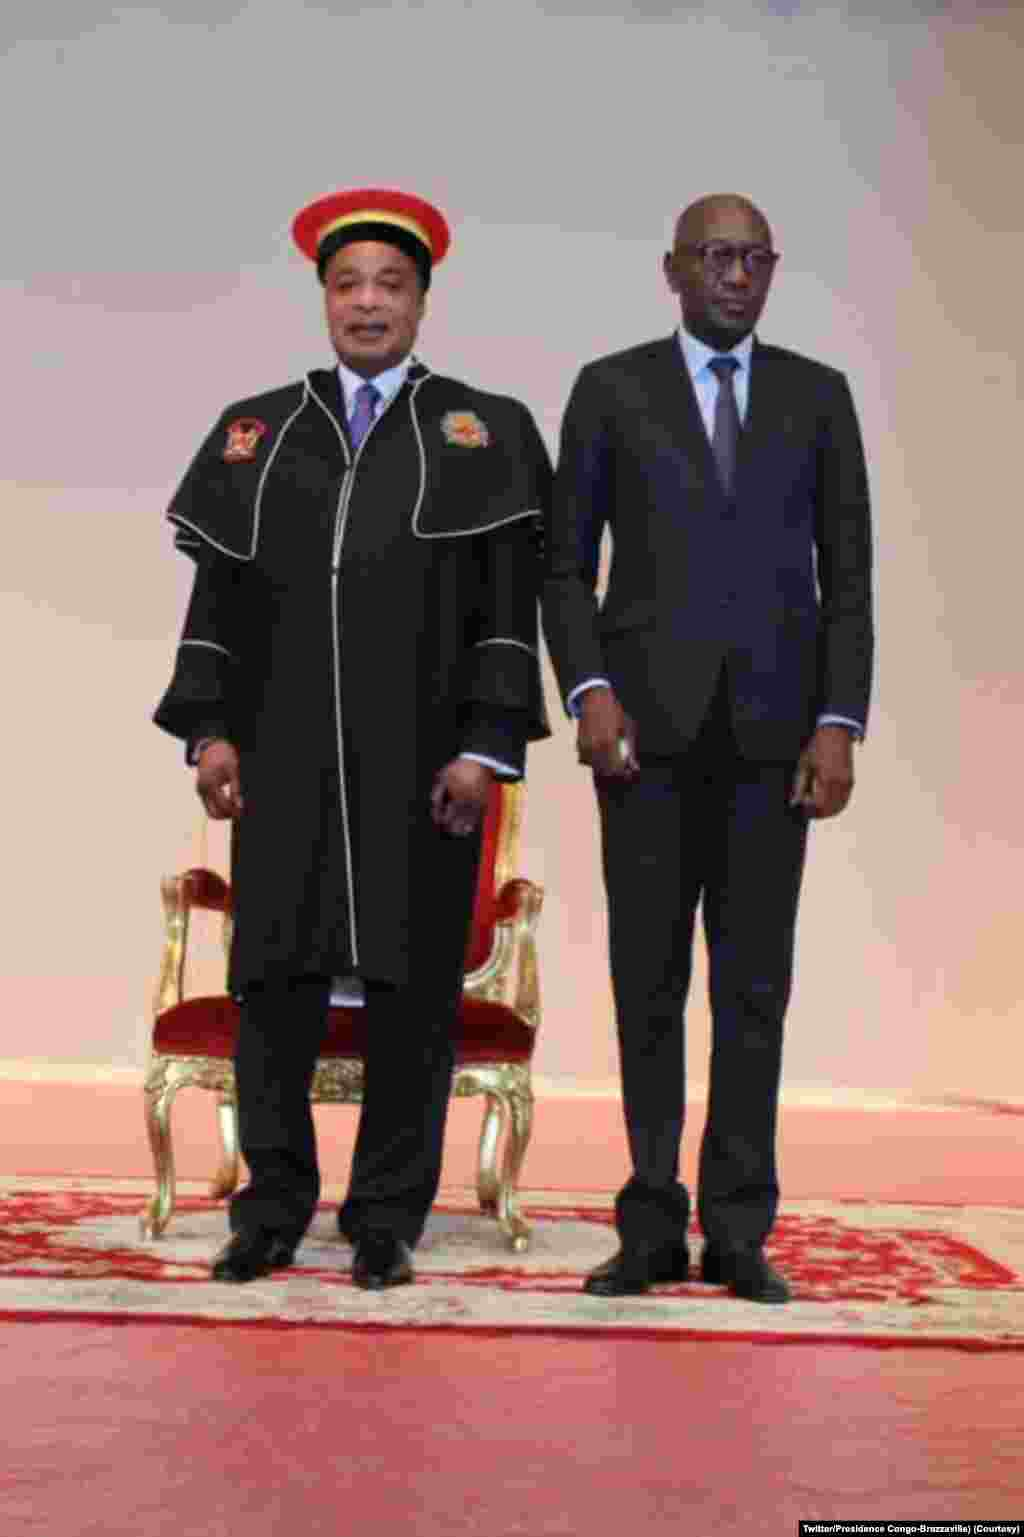 Président Denis Sassou N'Guesso na milulu ya bopesi palata ya Docteur Honoris Causa ya Université Marien Ngouabi, na PAlais ya Congrès, Brazzaville, 12 novembre 2020. (Twitter/Pr♪0sidence Congo-Brazzaville)